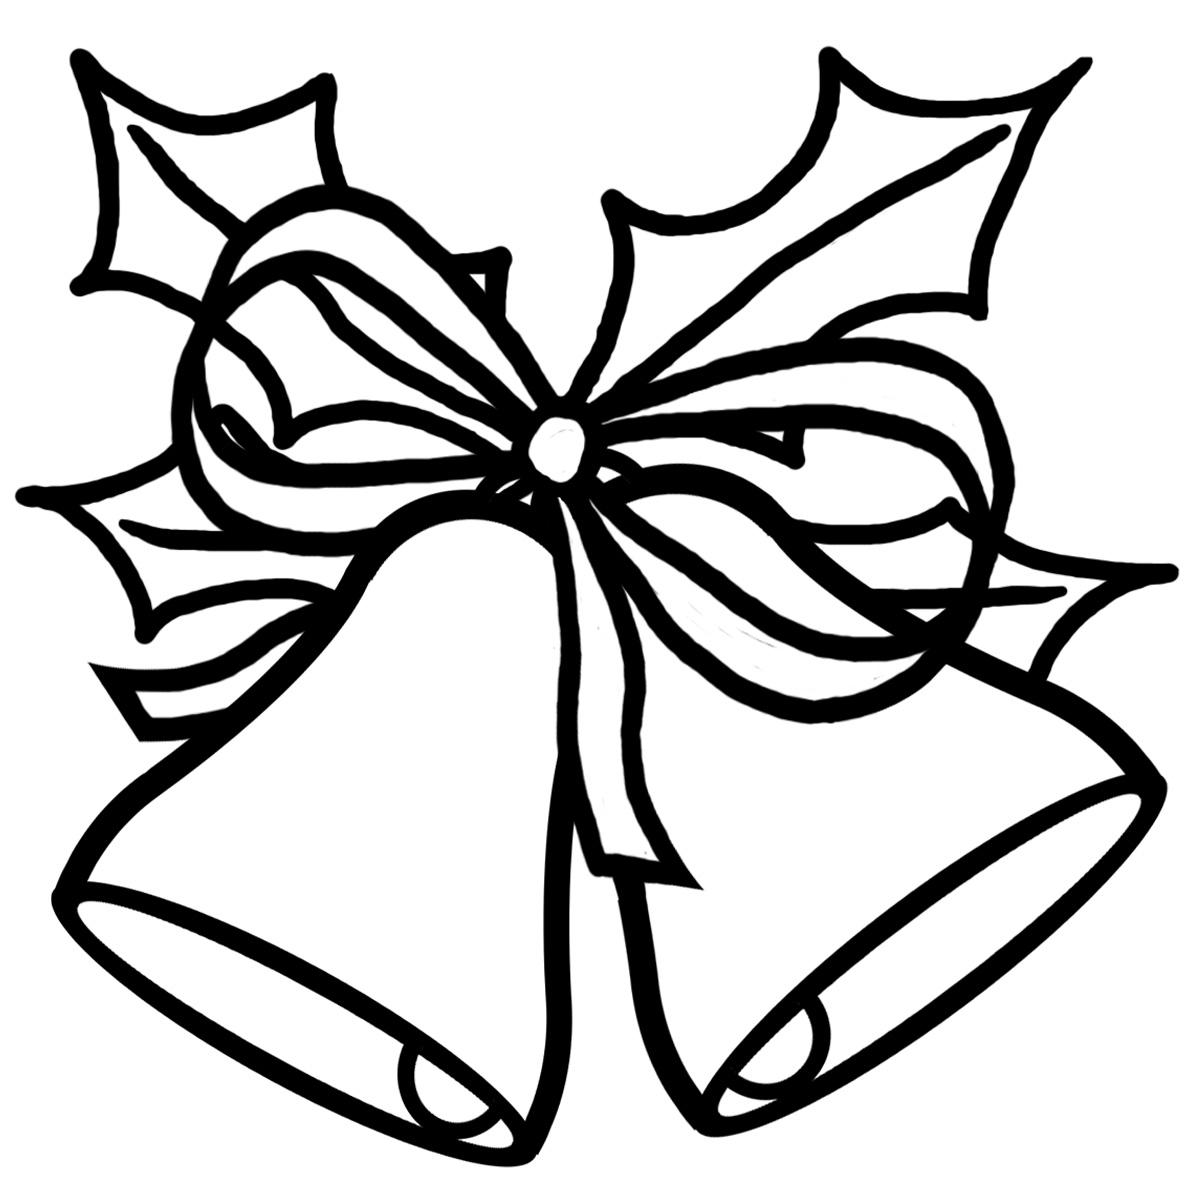 1200x1200 Black And White Christmas Clip Art